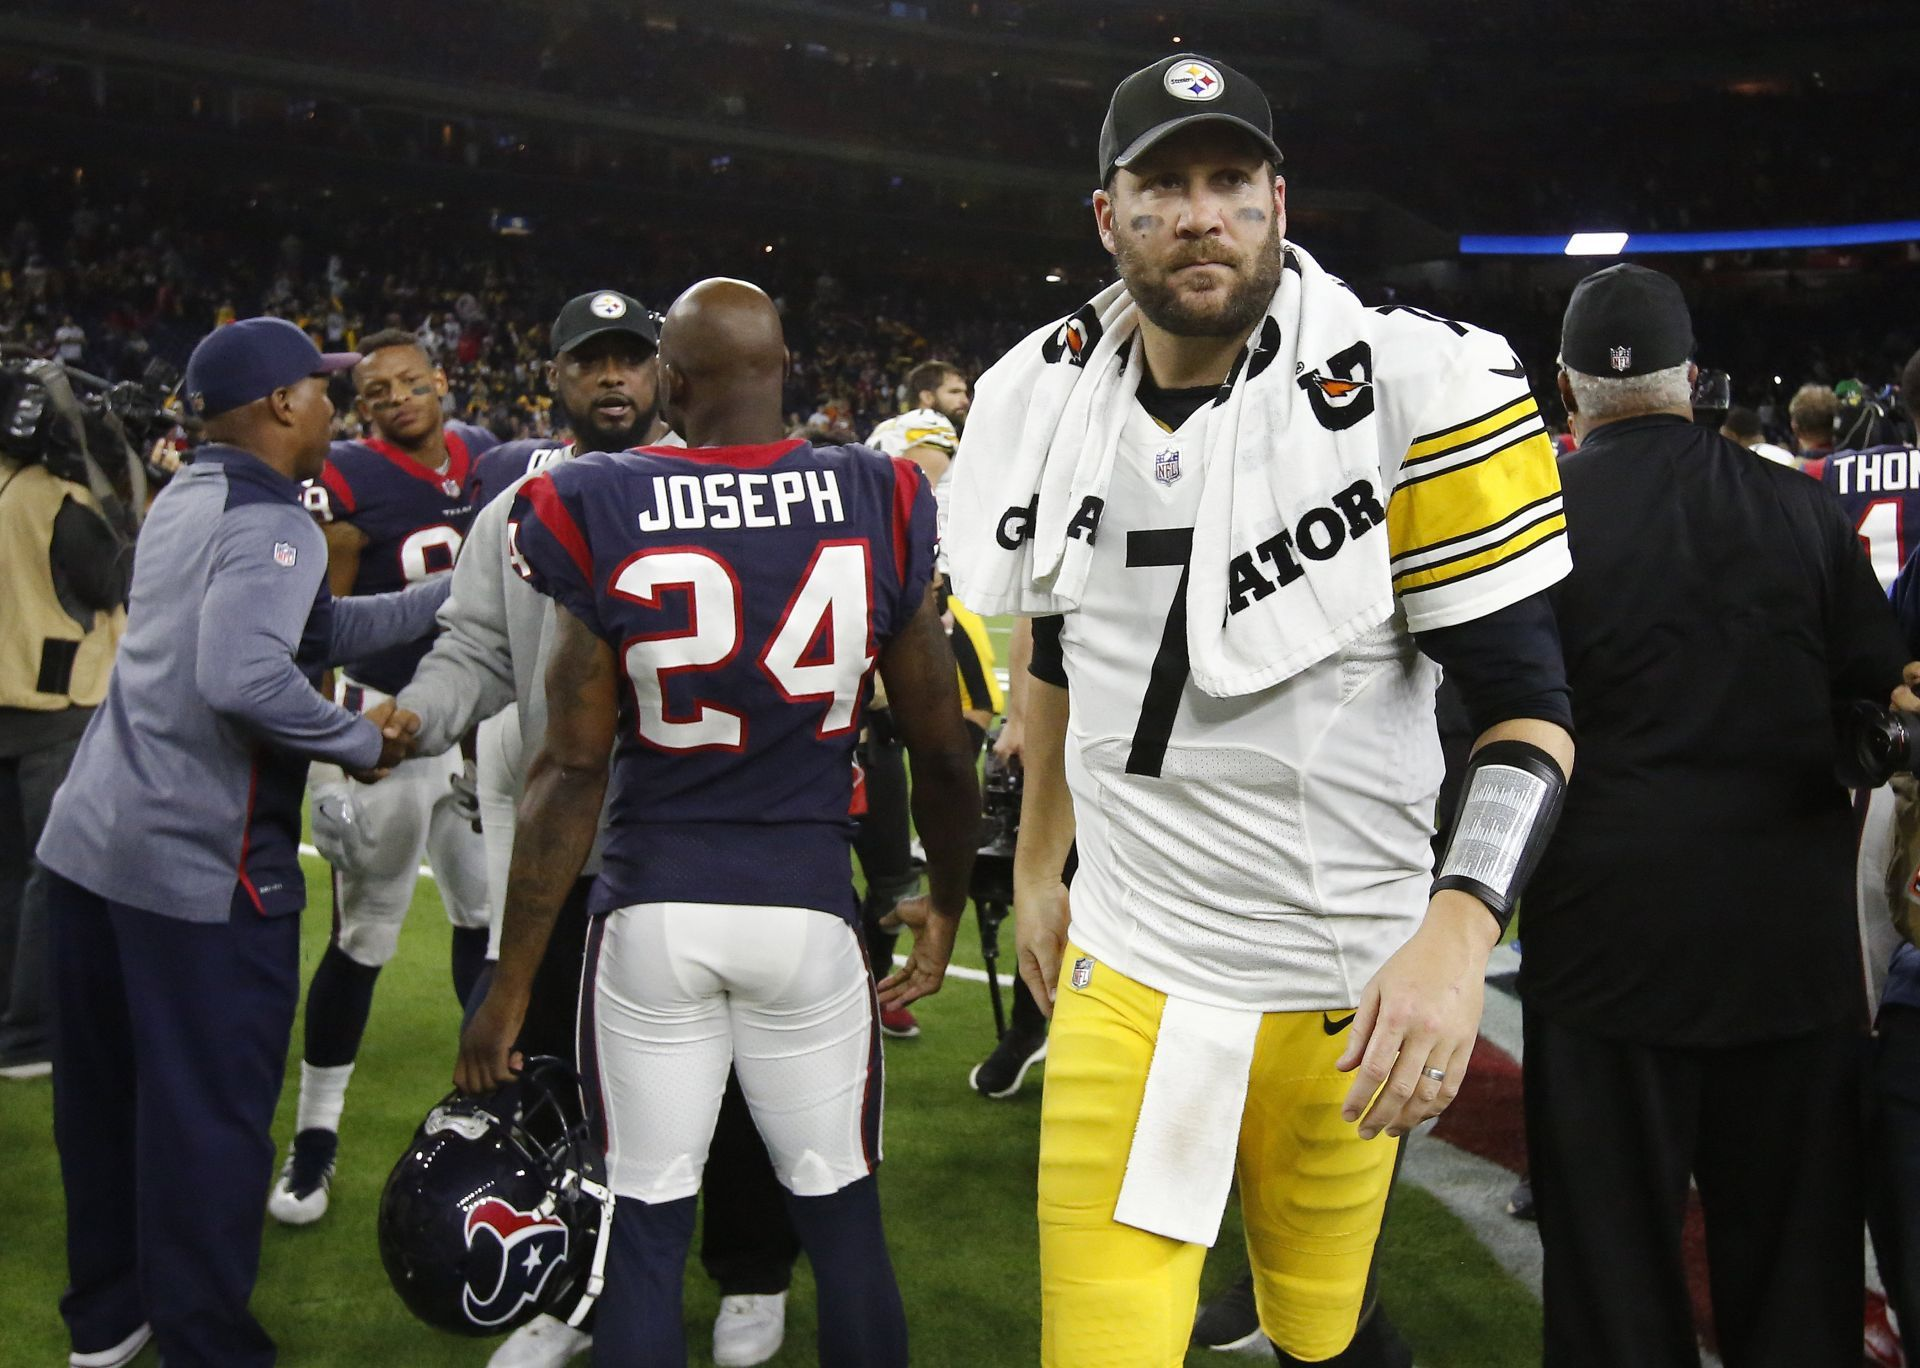 Roethlisberger da triunfo a Steelers evitan primera ronda playoffs